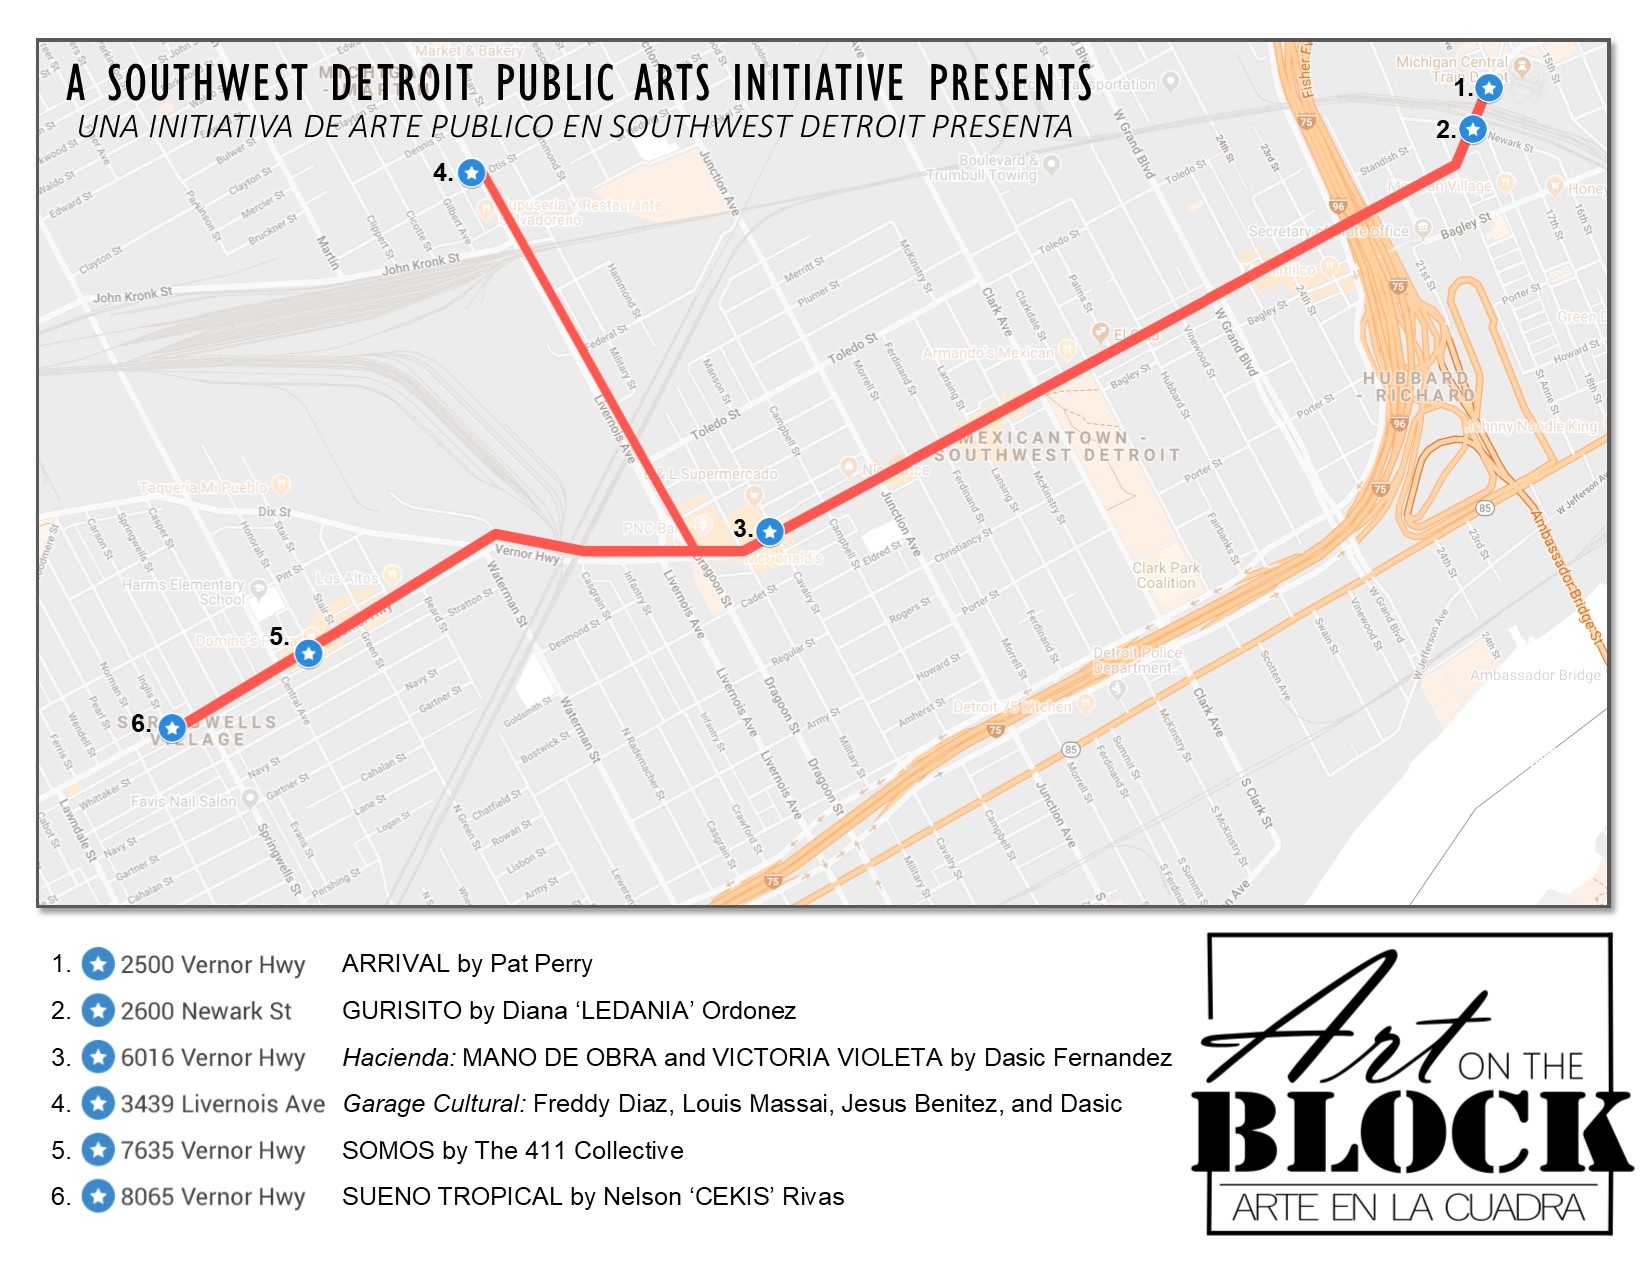 Projects | Art on the Block - Arte en la Cuadra | Patronicity on map of dearborn, map of neighborhoods in detroit, map of lincoln park, map of brownstown, map of romulus, map of west detroit, map of river rouge, map of se detroit, map of westland,